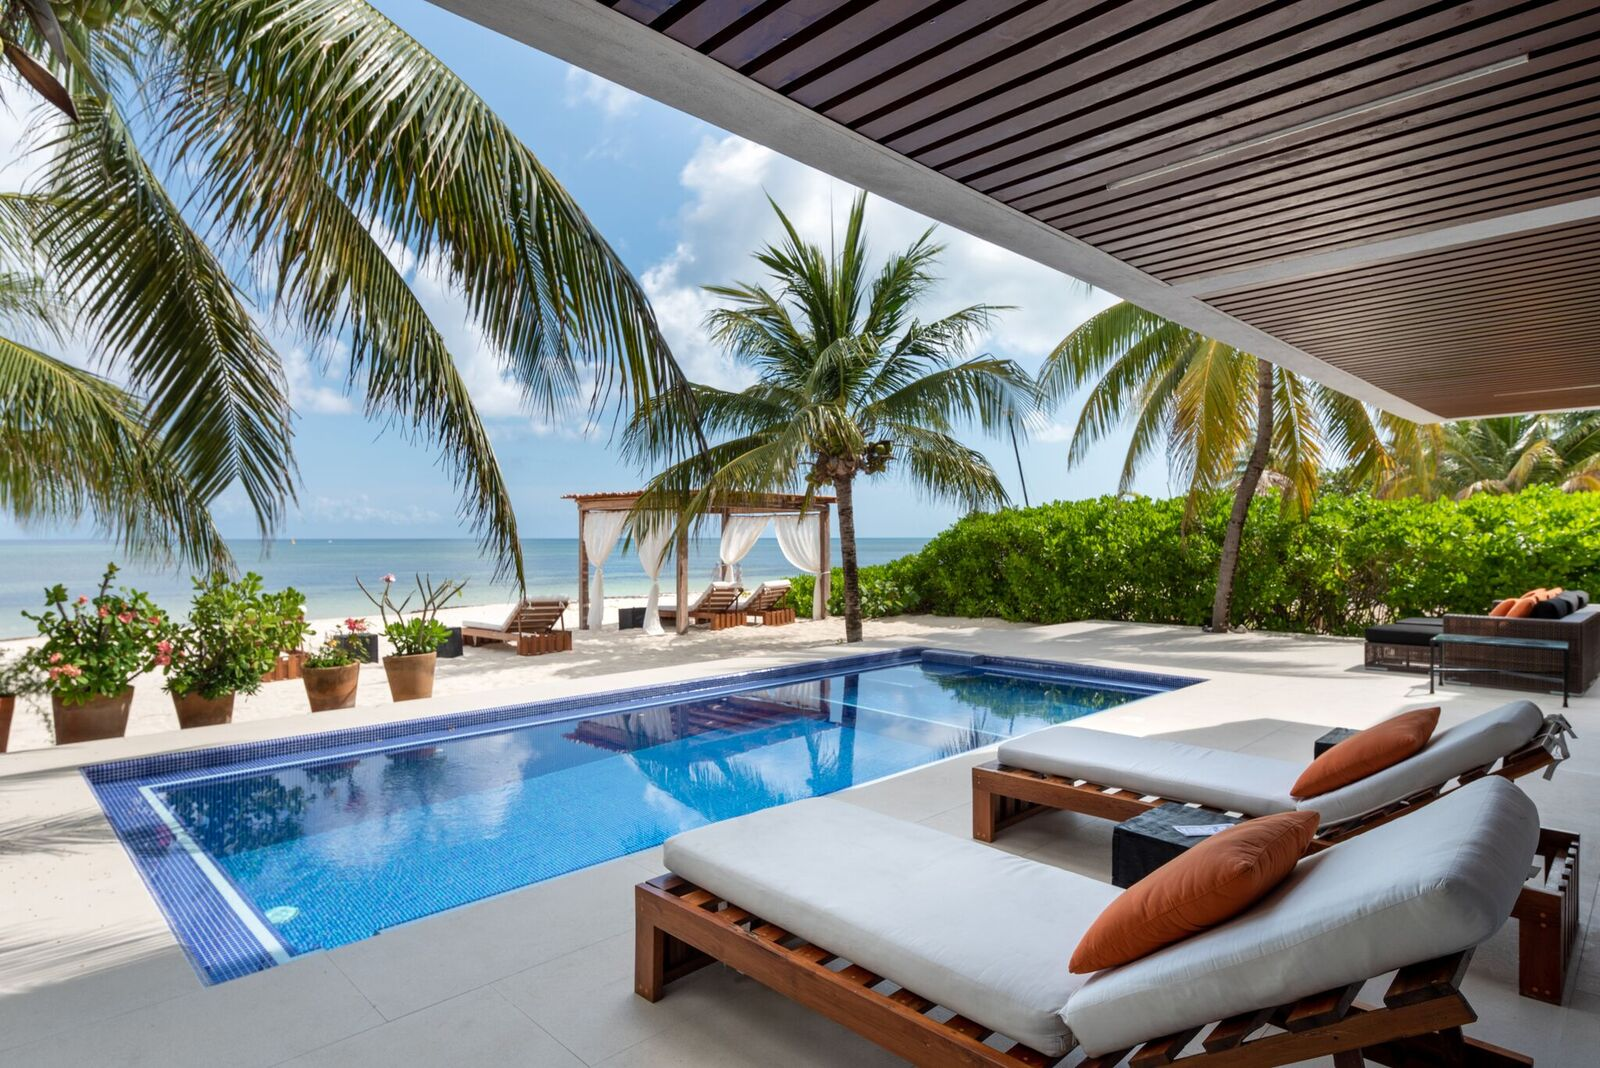 Villa del Sol - Beachfront Cozumel vacation rental villa